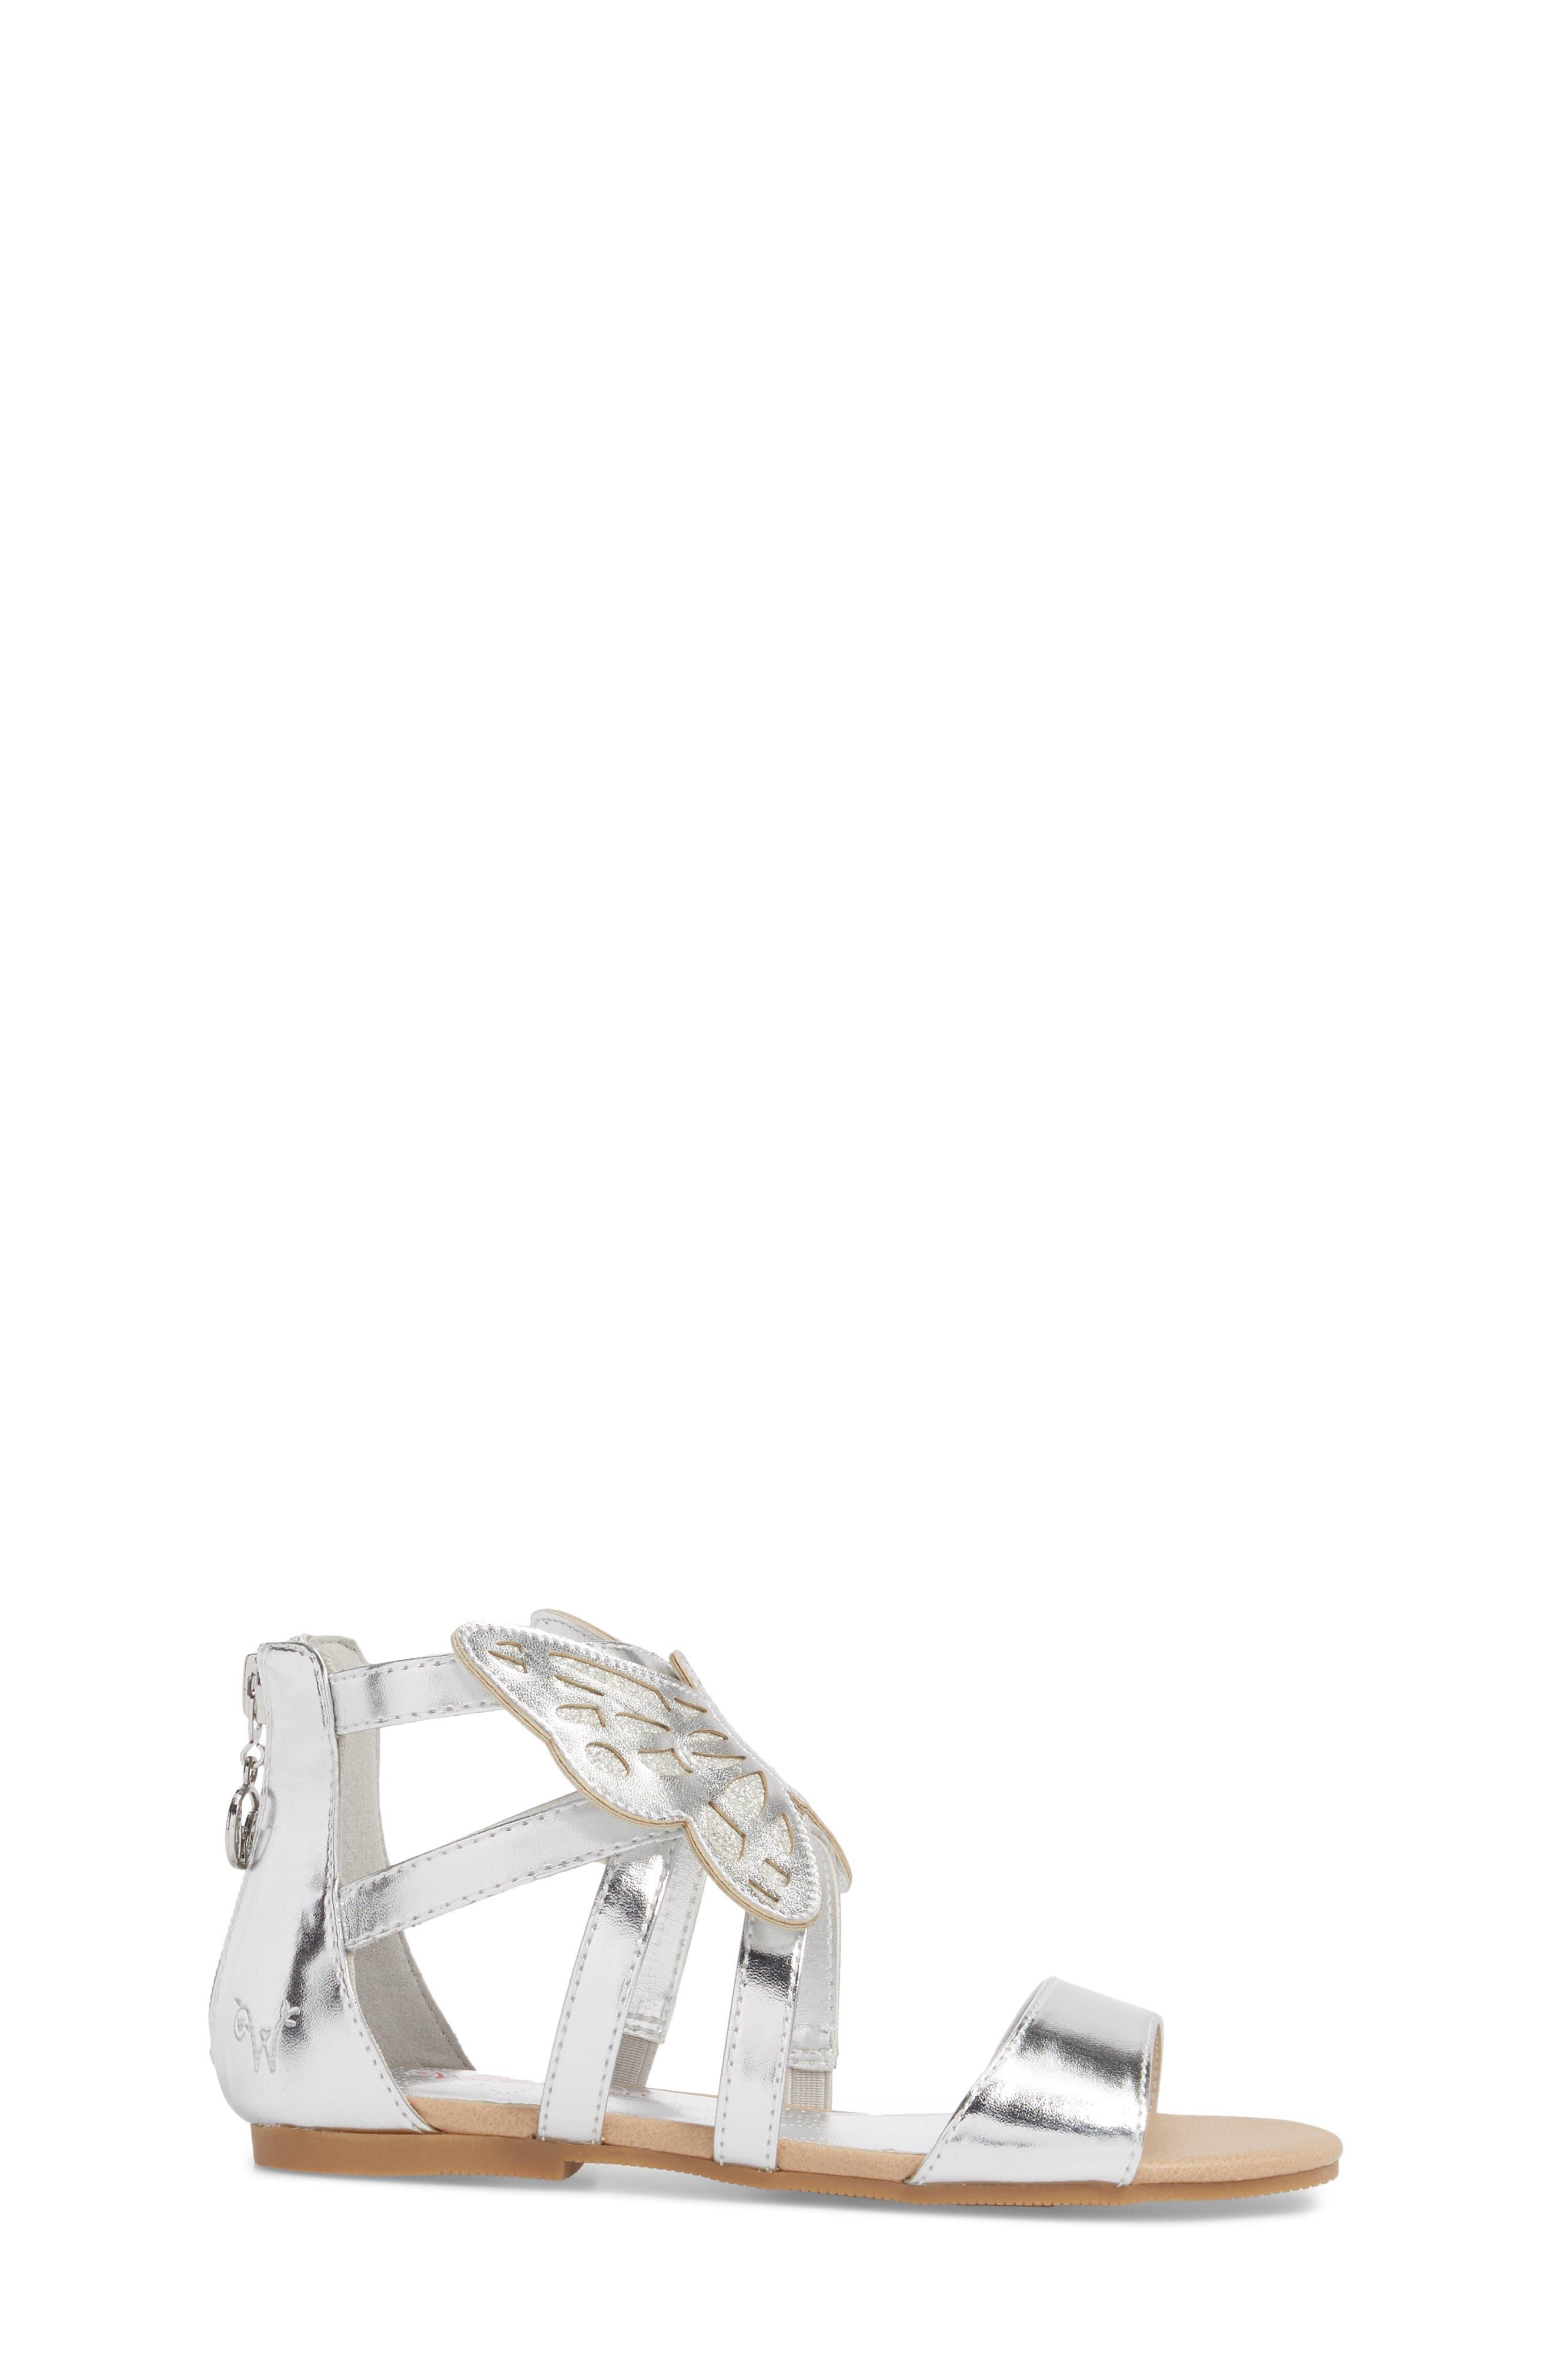 Alternate Image 3  - WellieWishers from American Girl Willa Flutter Metallic Sandal (Walker, Toddler & Little Kid)